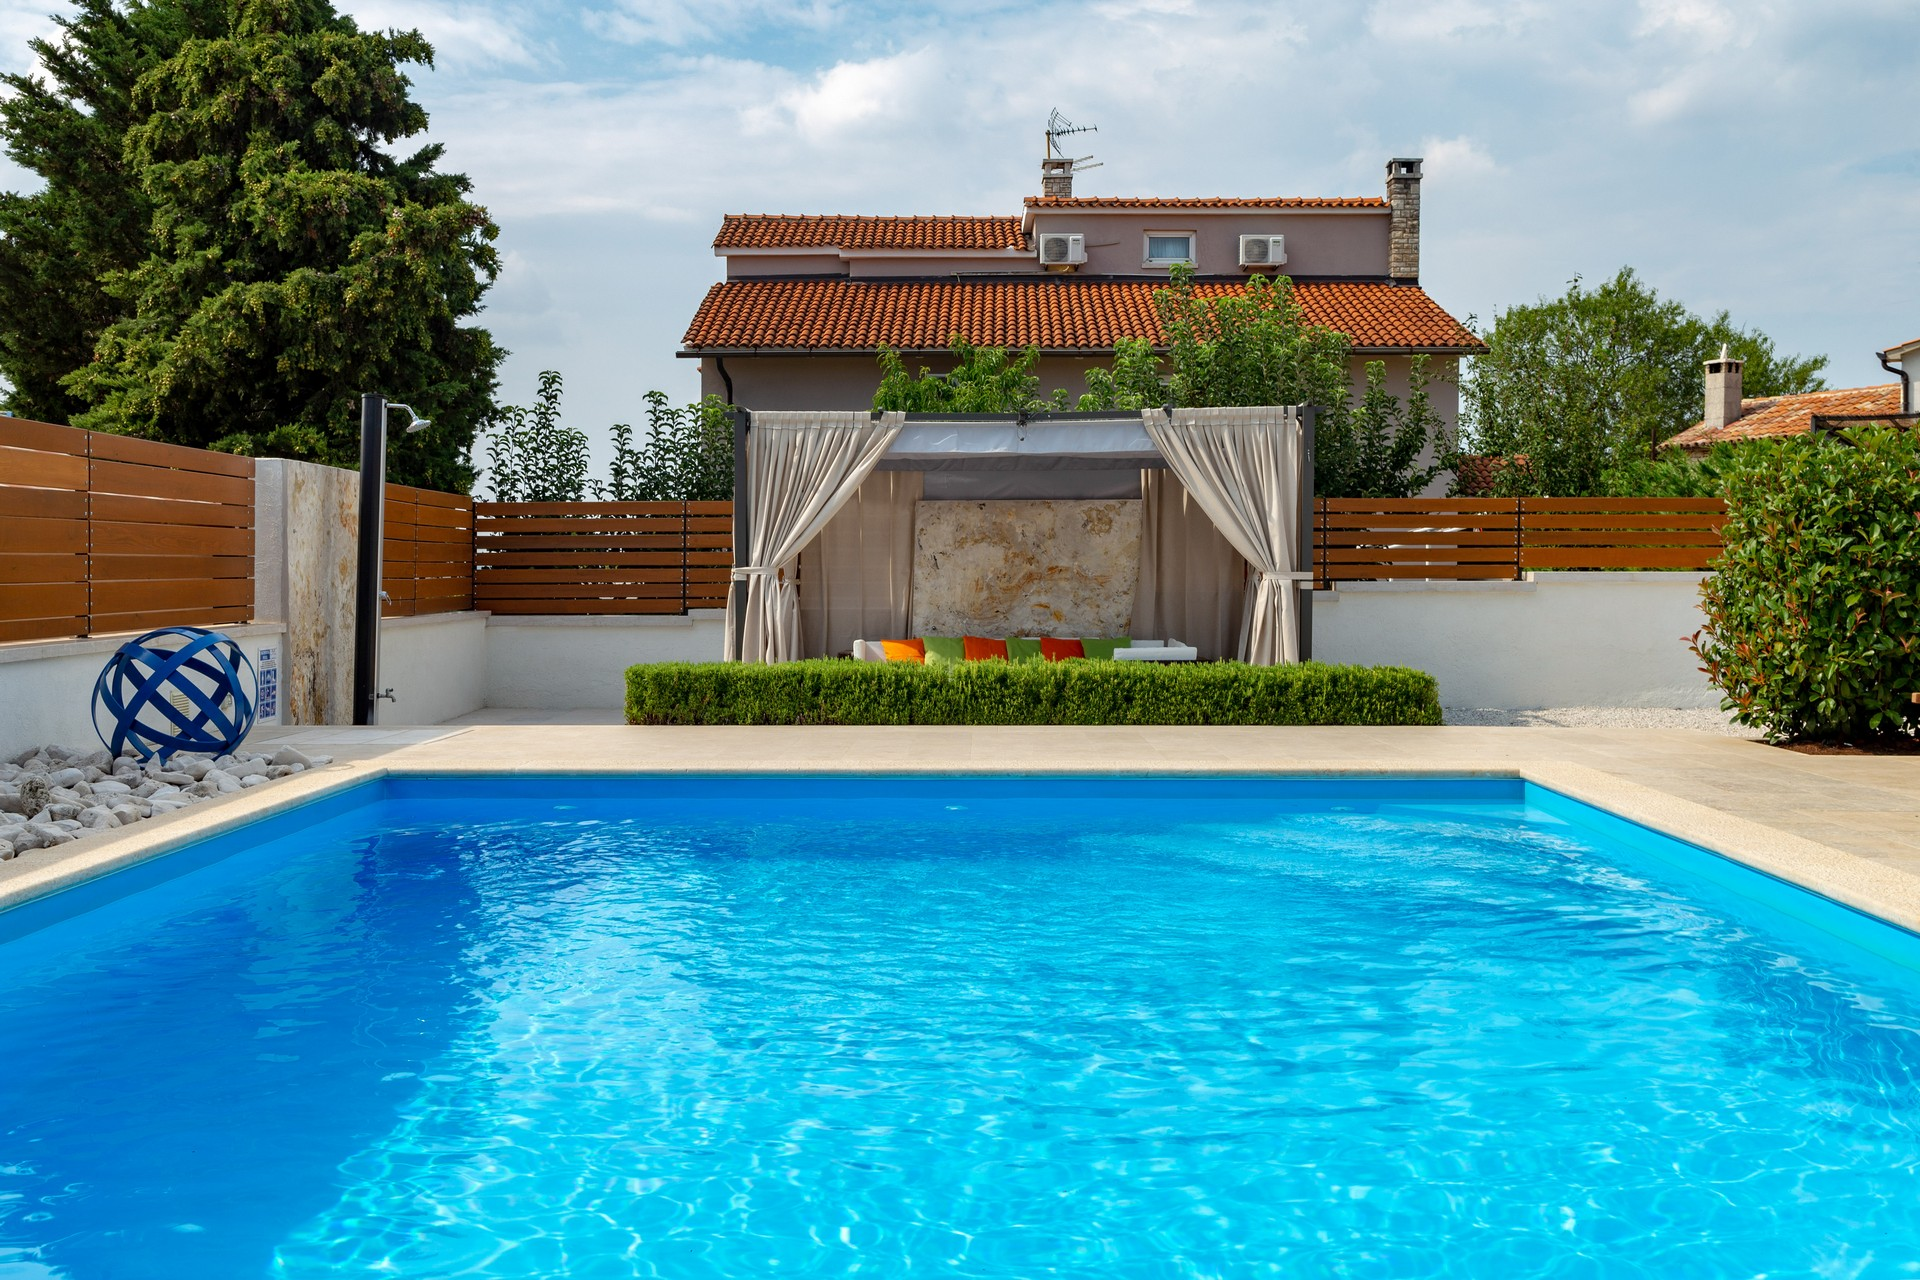 villa deal outdoors (6)